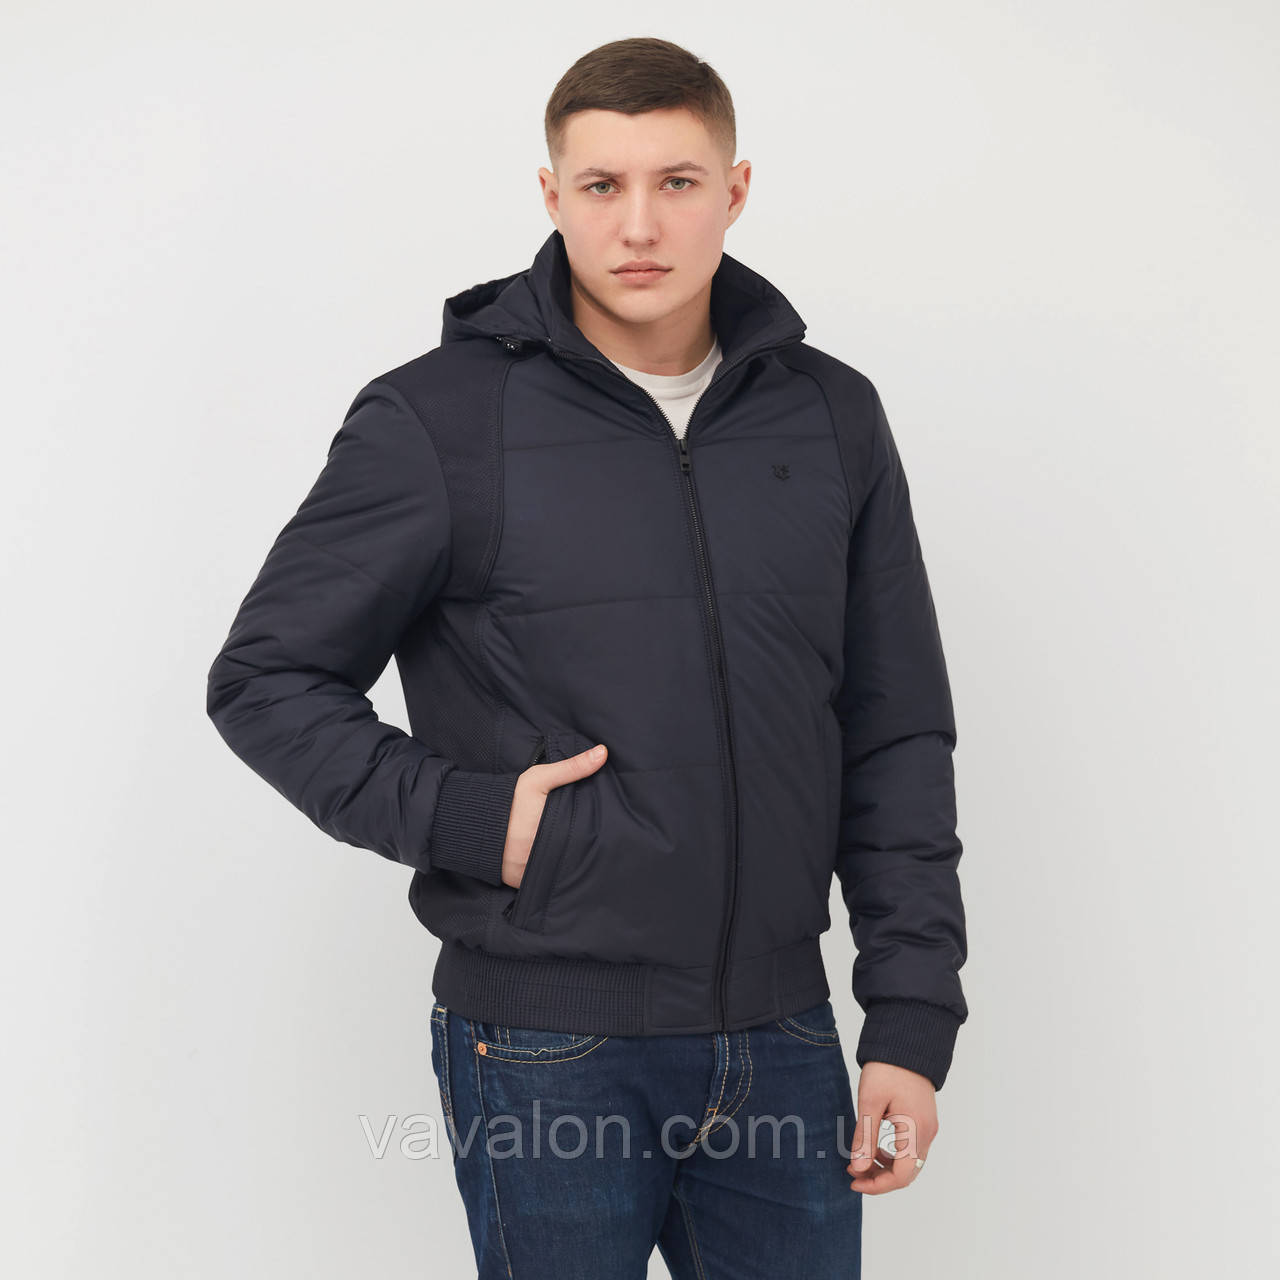 Куртка демисезонная под резинку Vavalon KD-182 navy